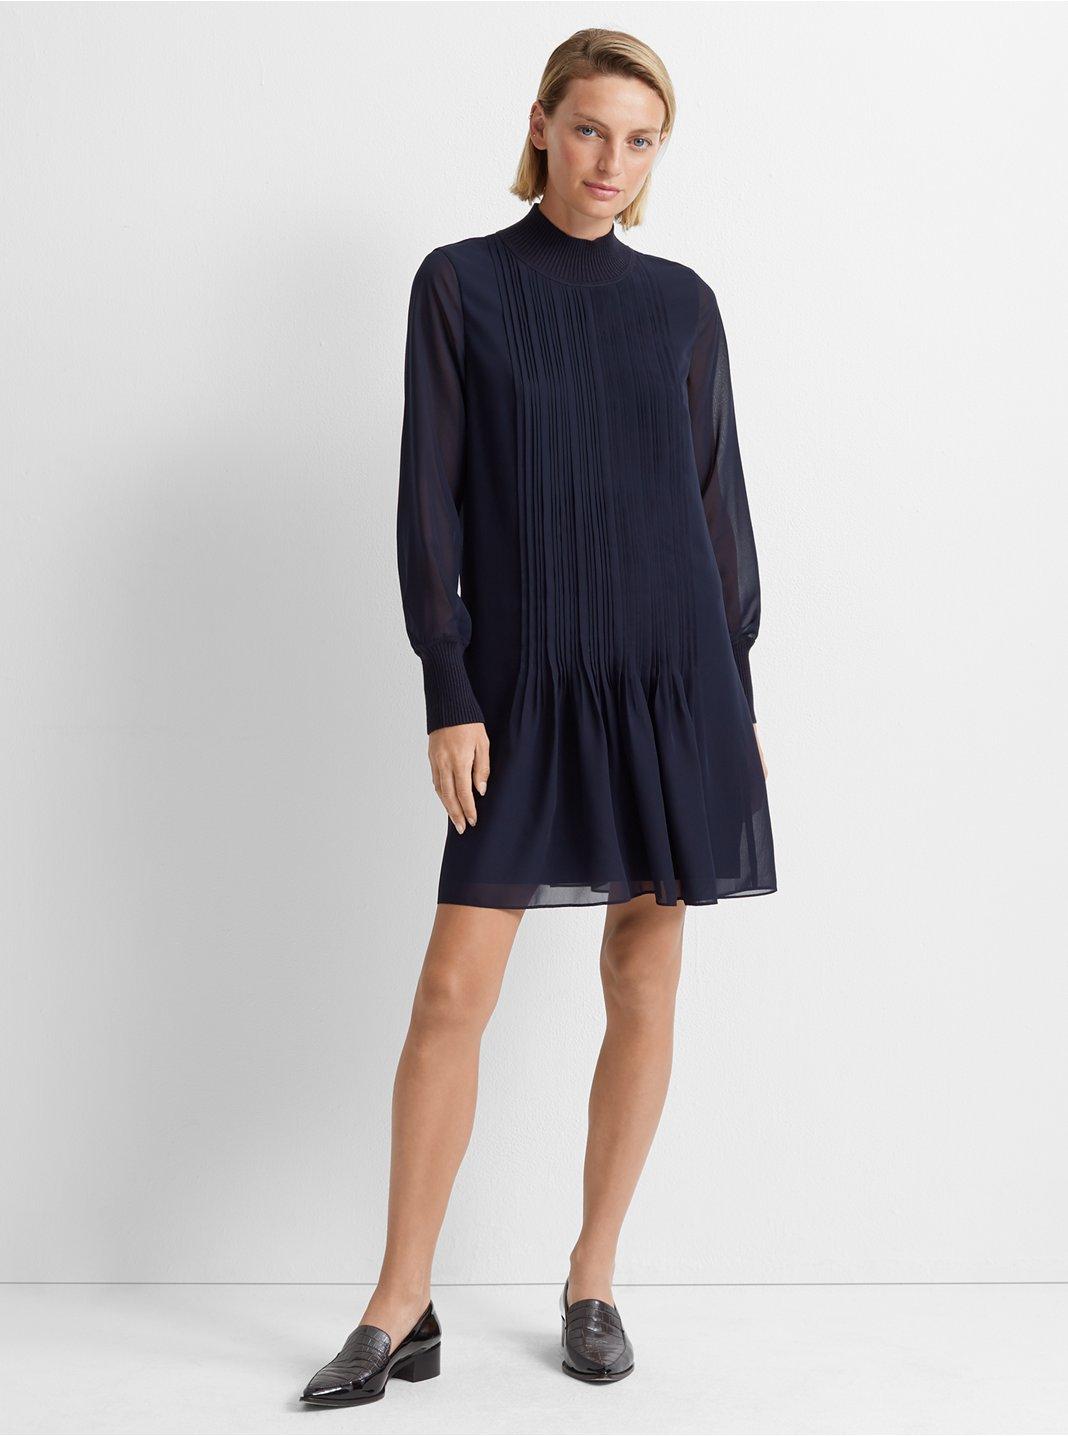 Pintuck Rib Dress